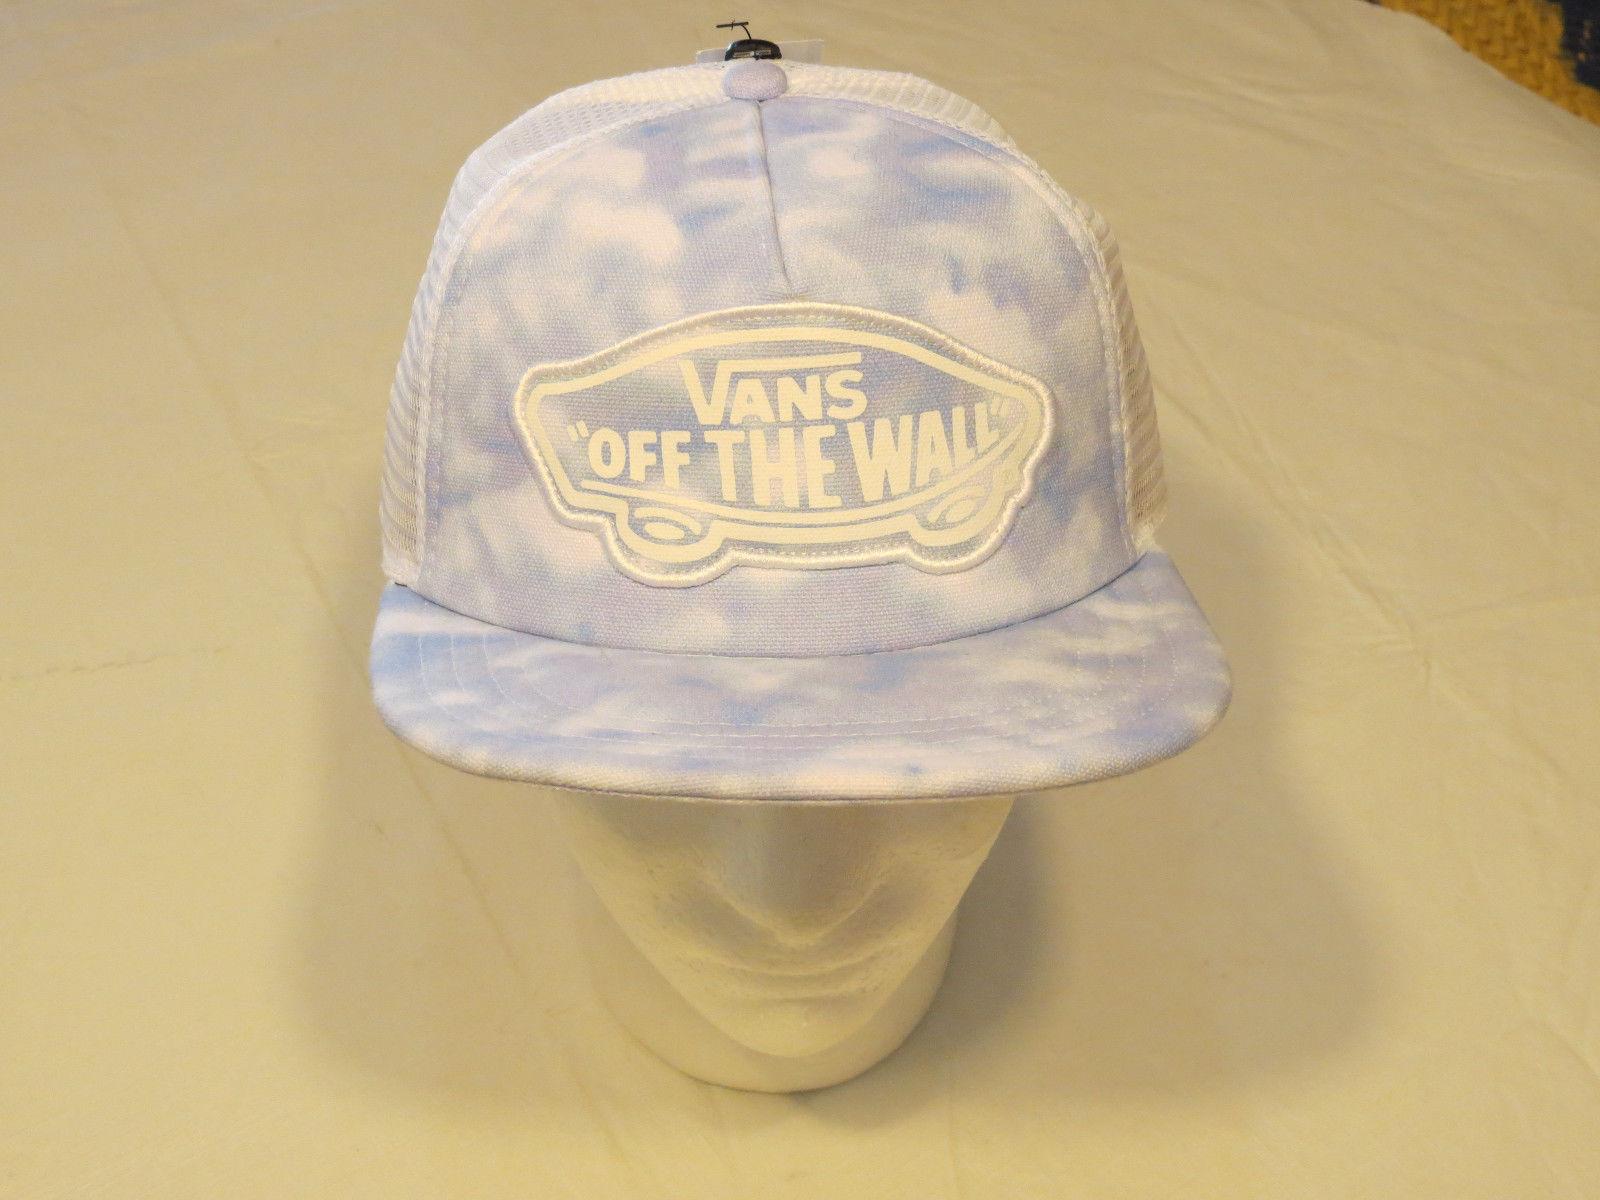 new arrival 61424 ccde6 Van s off the wall Vans trucker hat cap NEW and 19 similar items